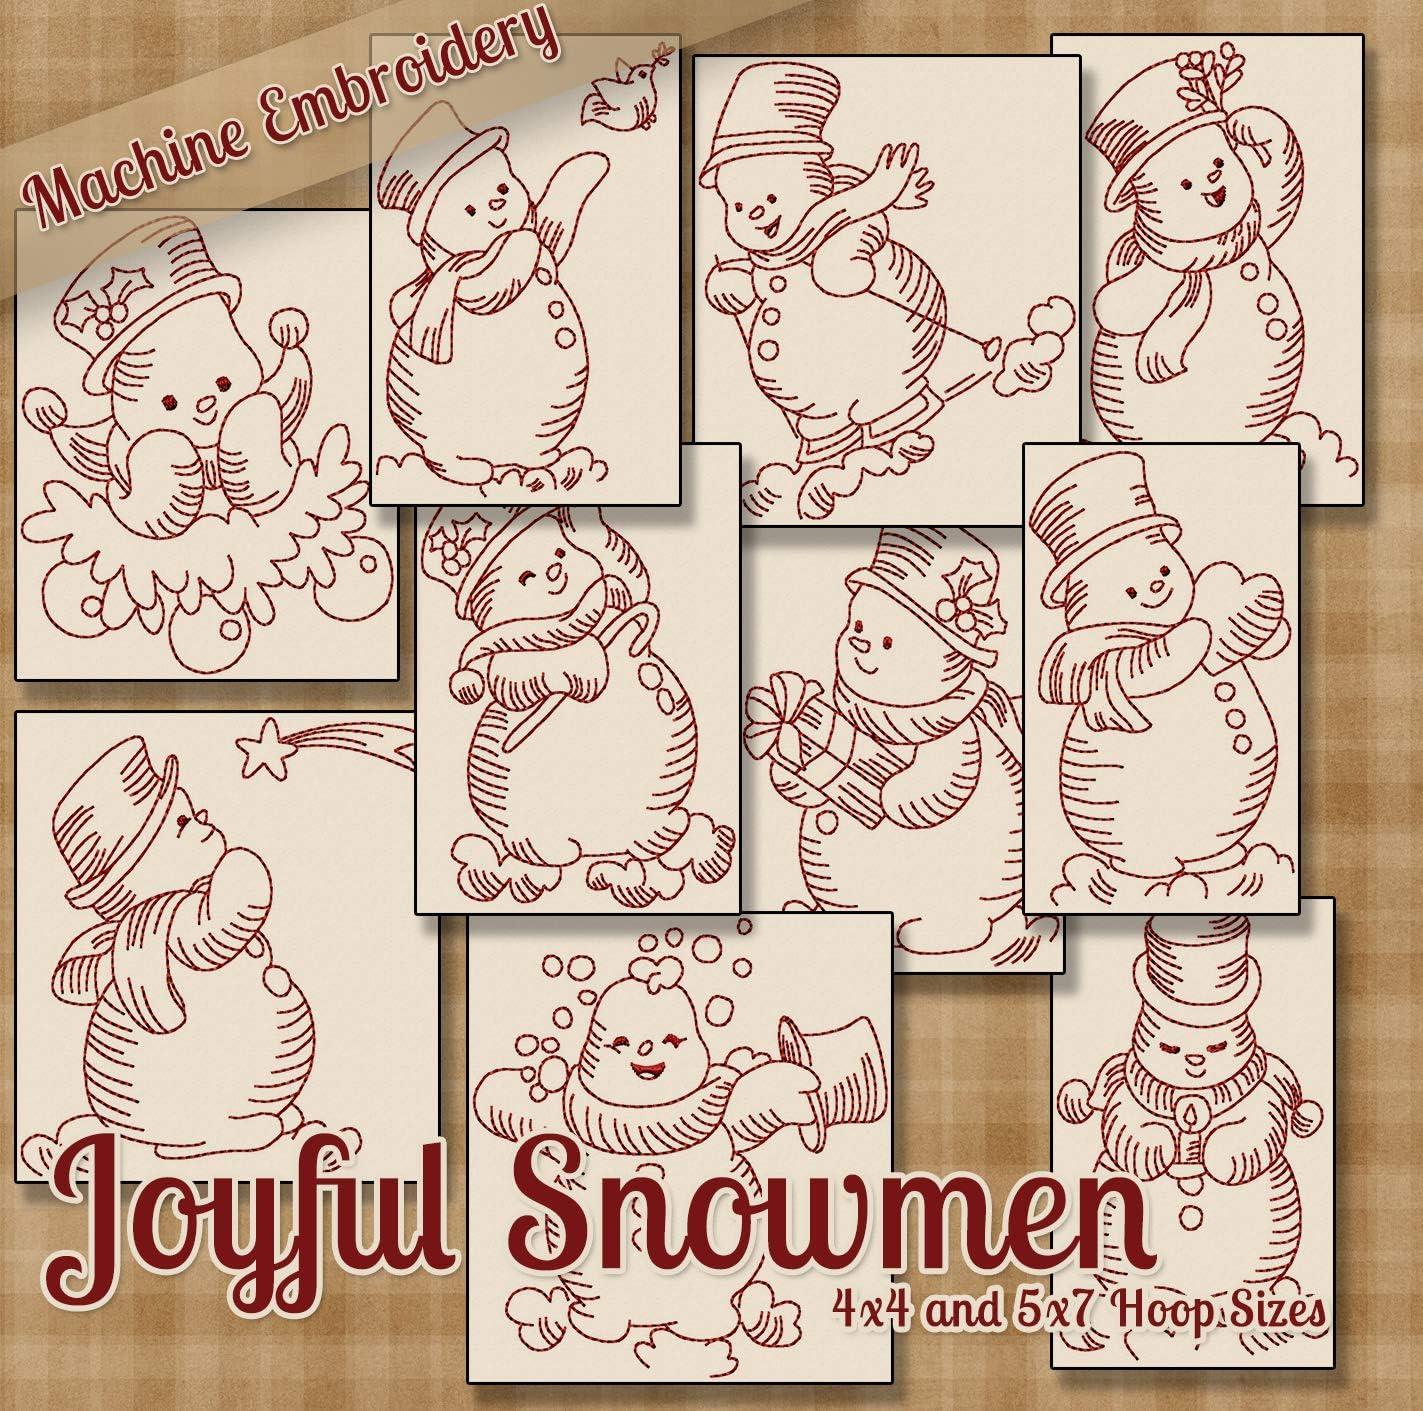 Multiformat Pattern CD Joyful Snowmen Redwork Embroidery Machine Designs on CD